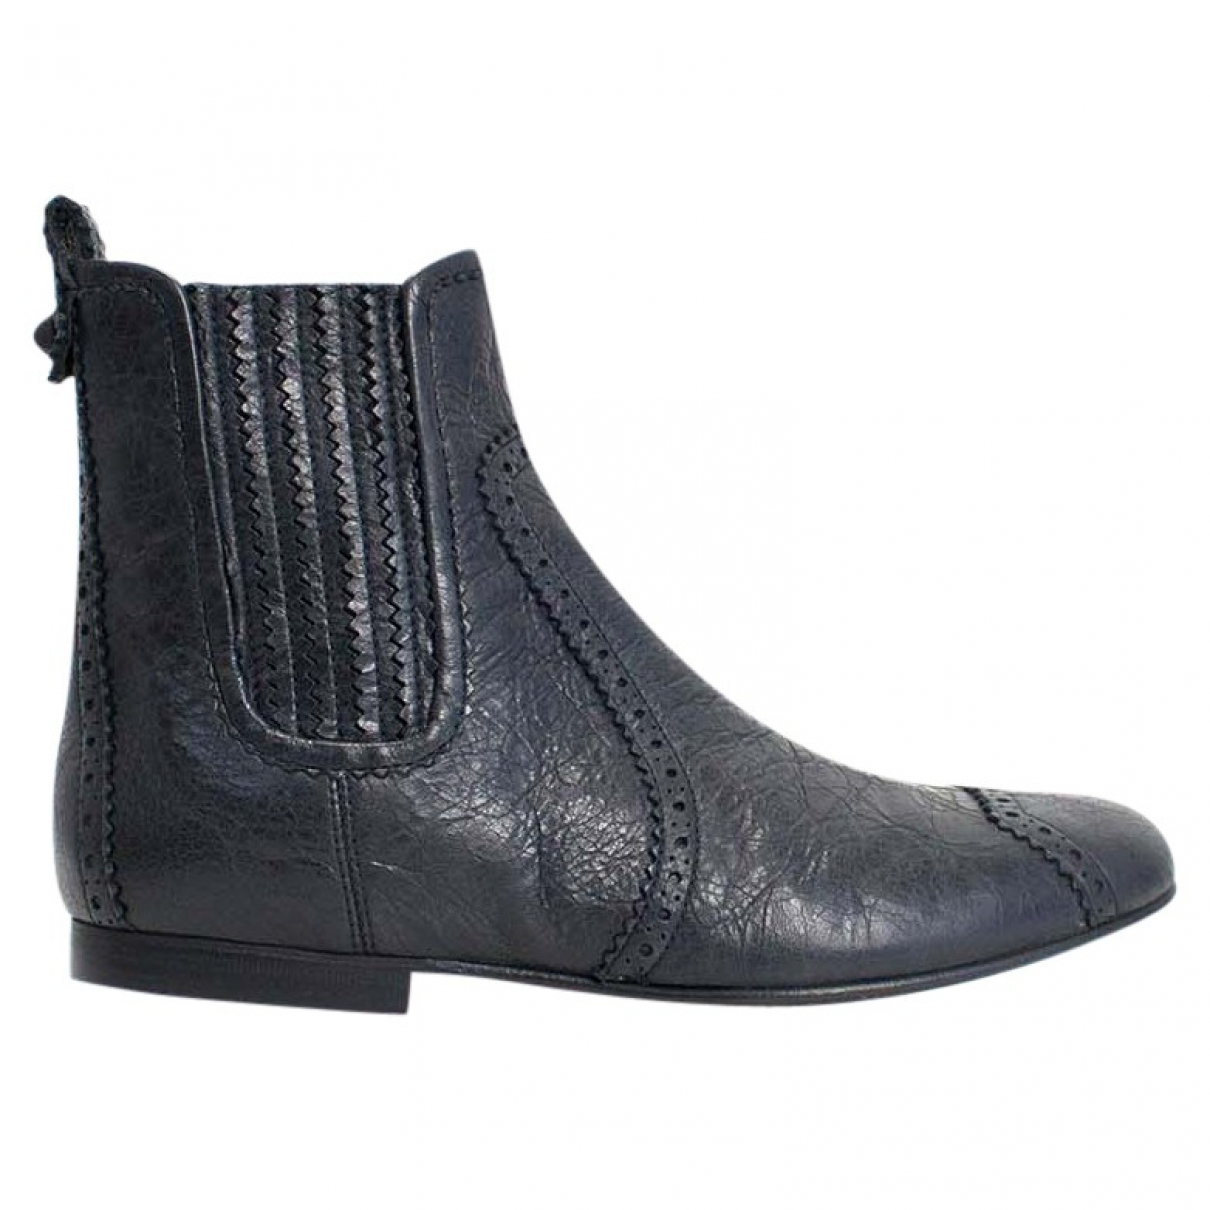 Balenciaga - Bottes   pour femme en cuir - noir